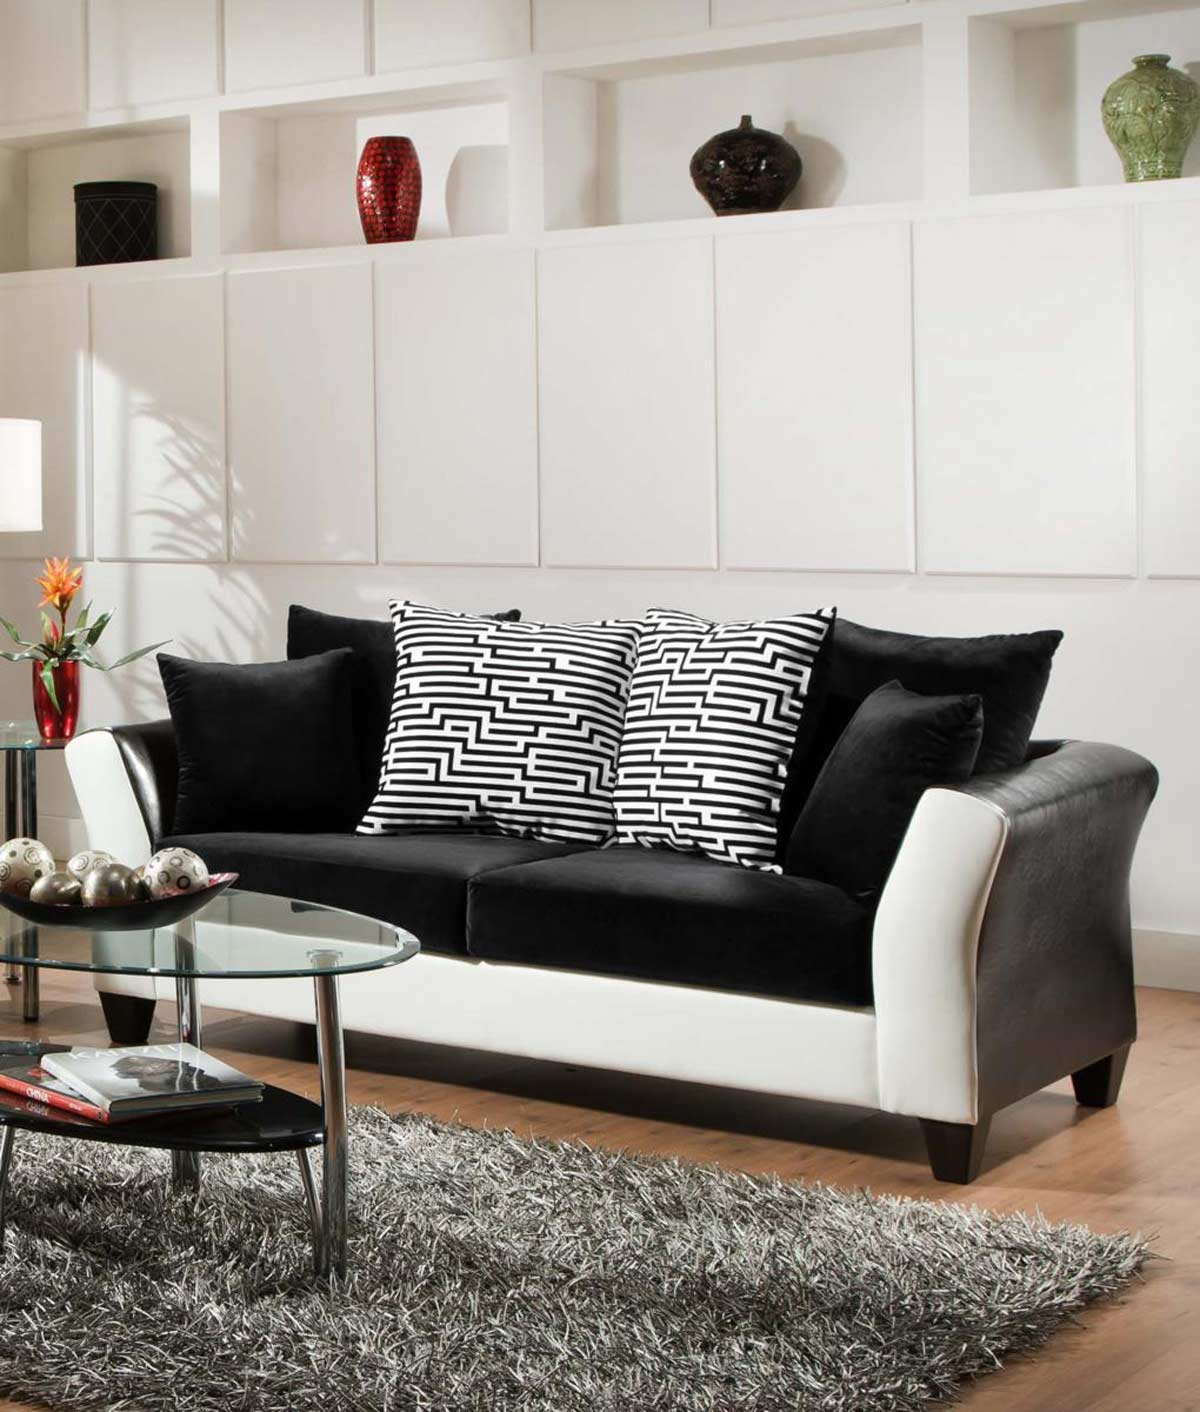 Chelsea Home Tau Sofa - Jefferson Black/Avanti White